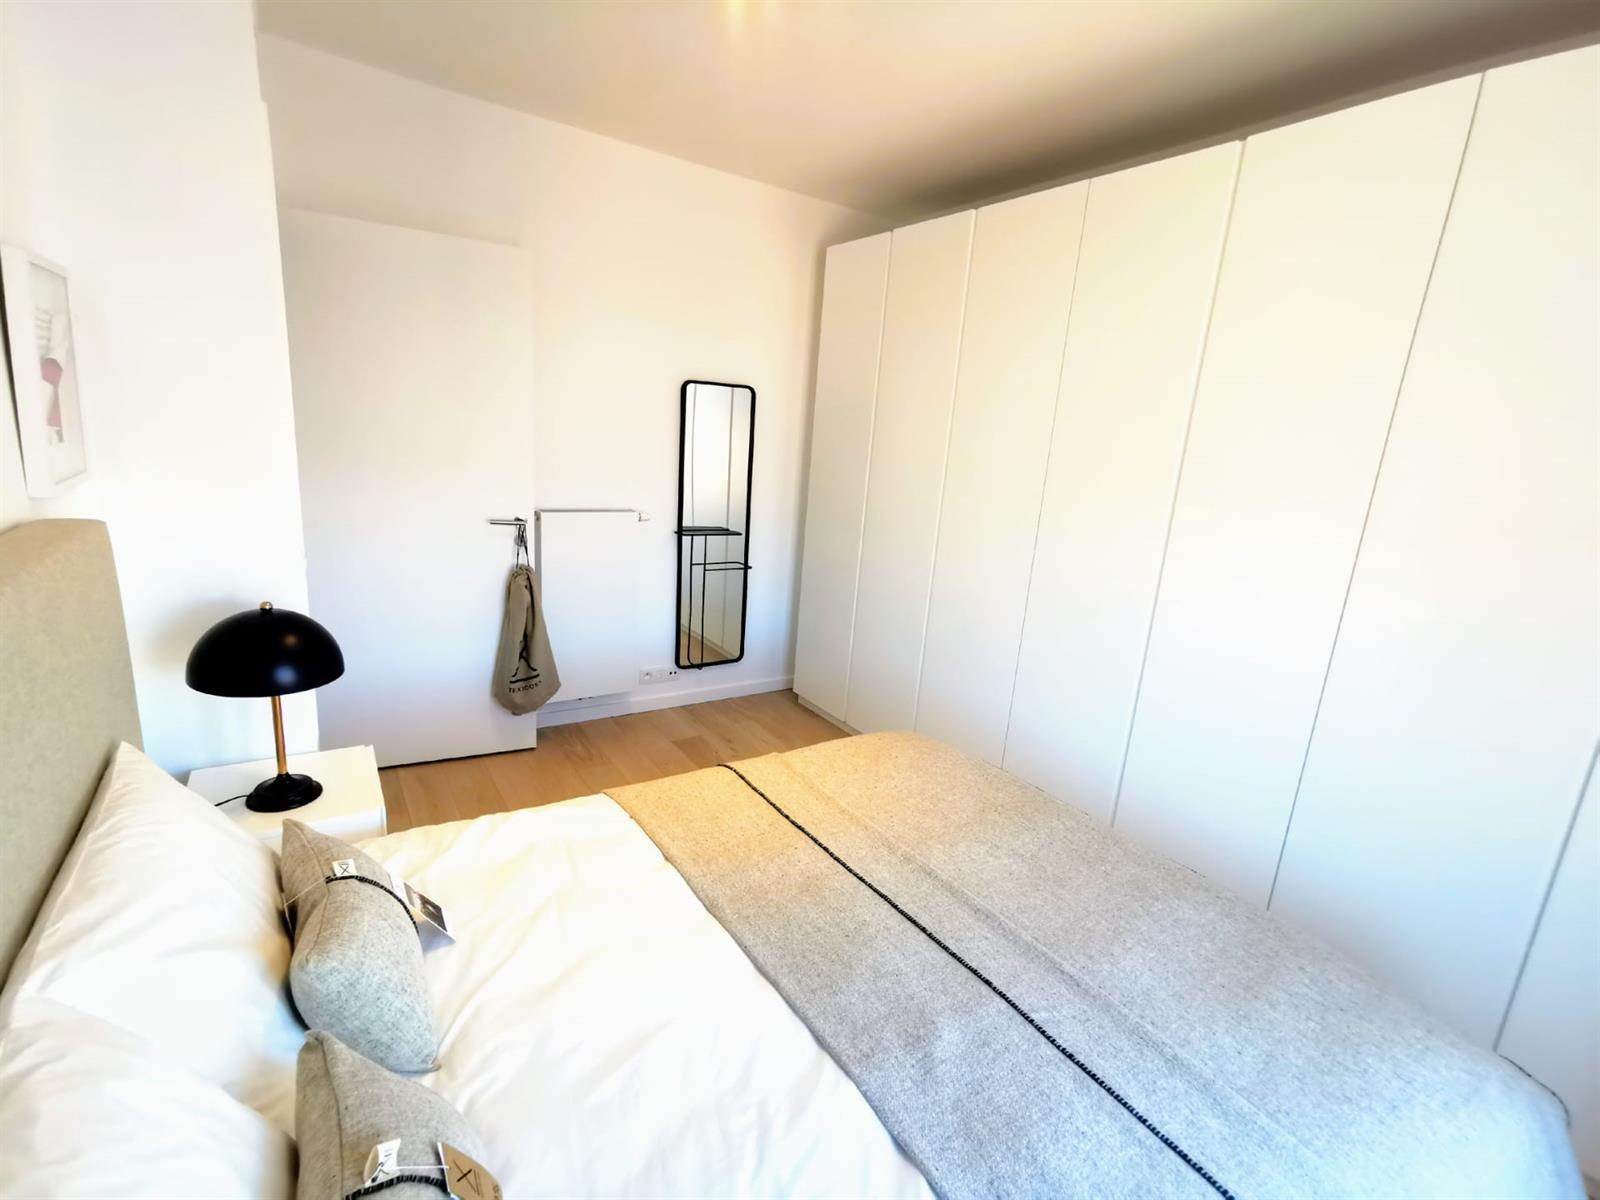 Appartement - Woluwe-Saint-Lambert - #4455516-10